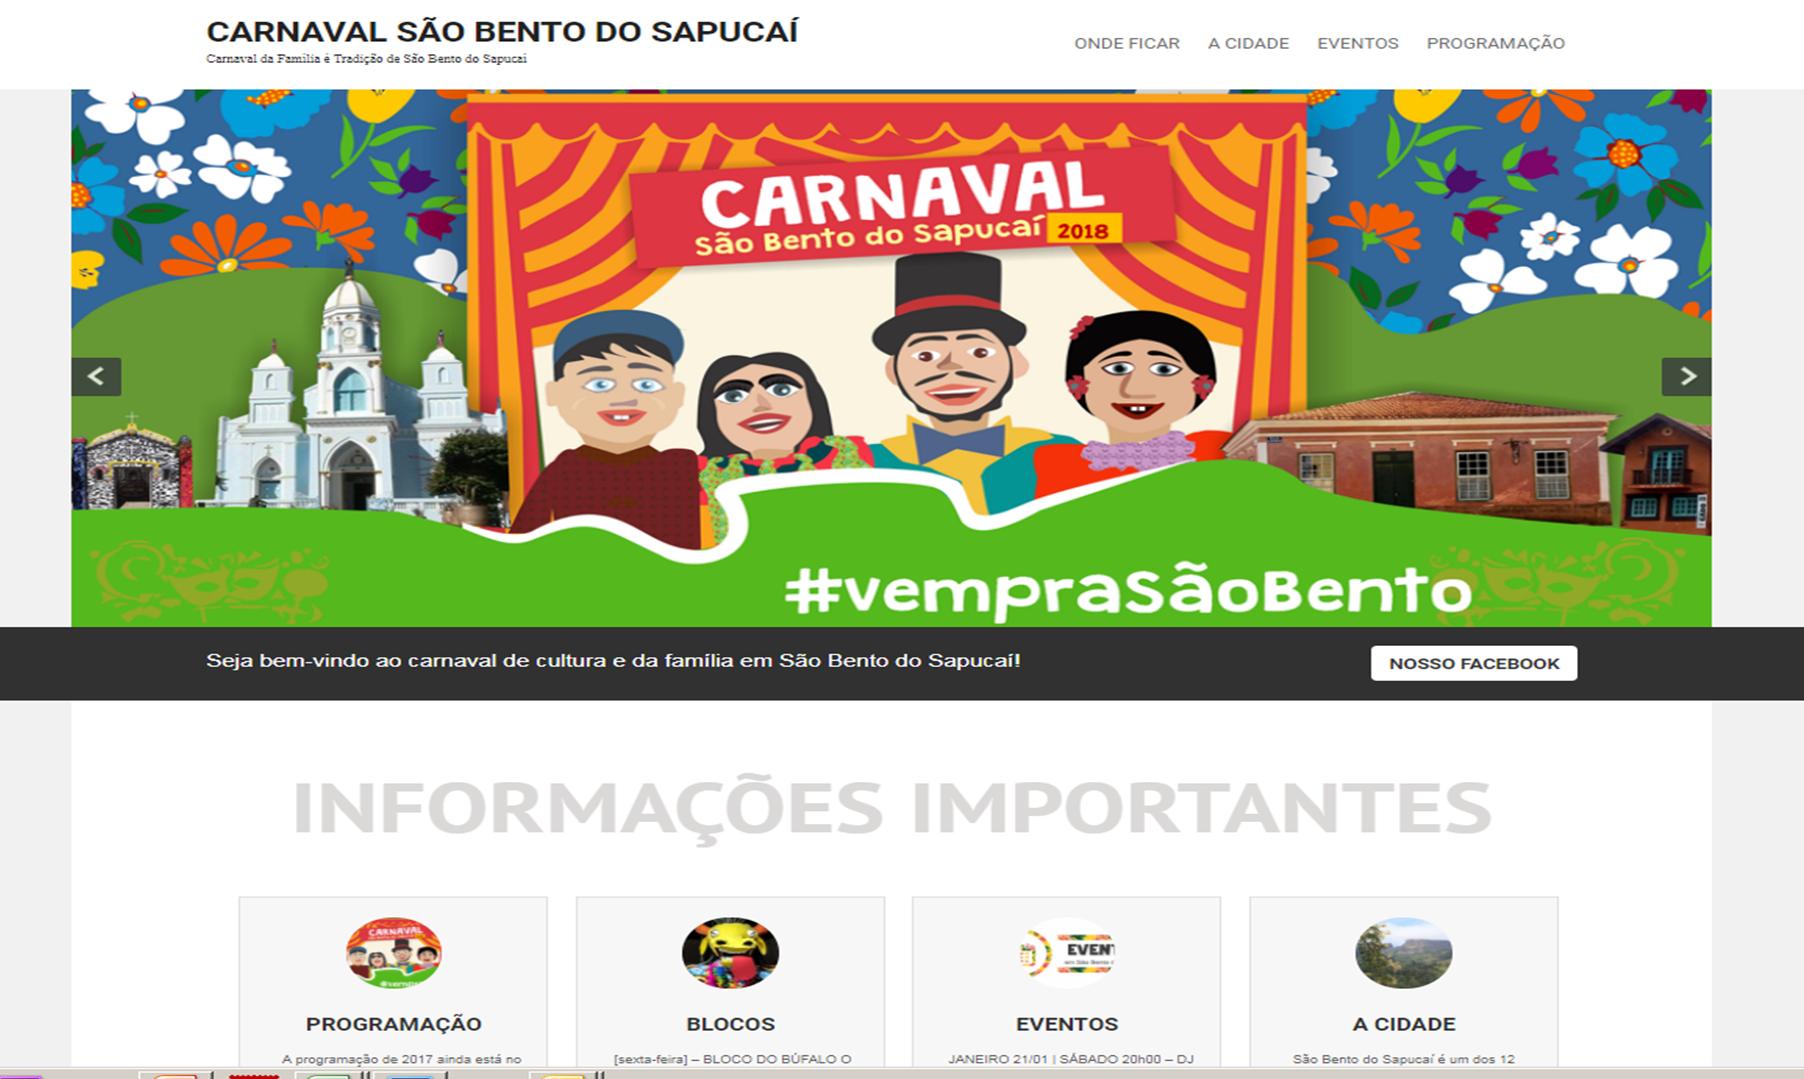 Carnaval São Bento do Sapucaí